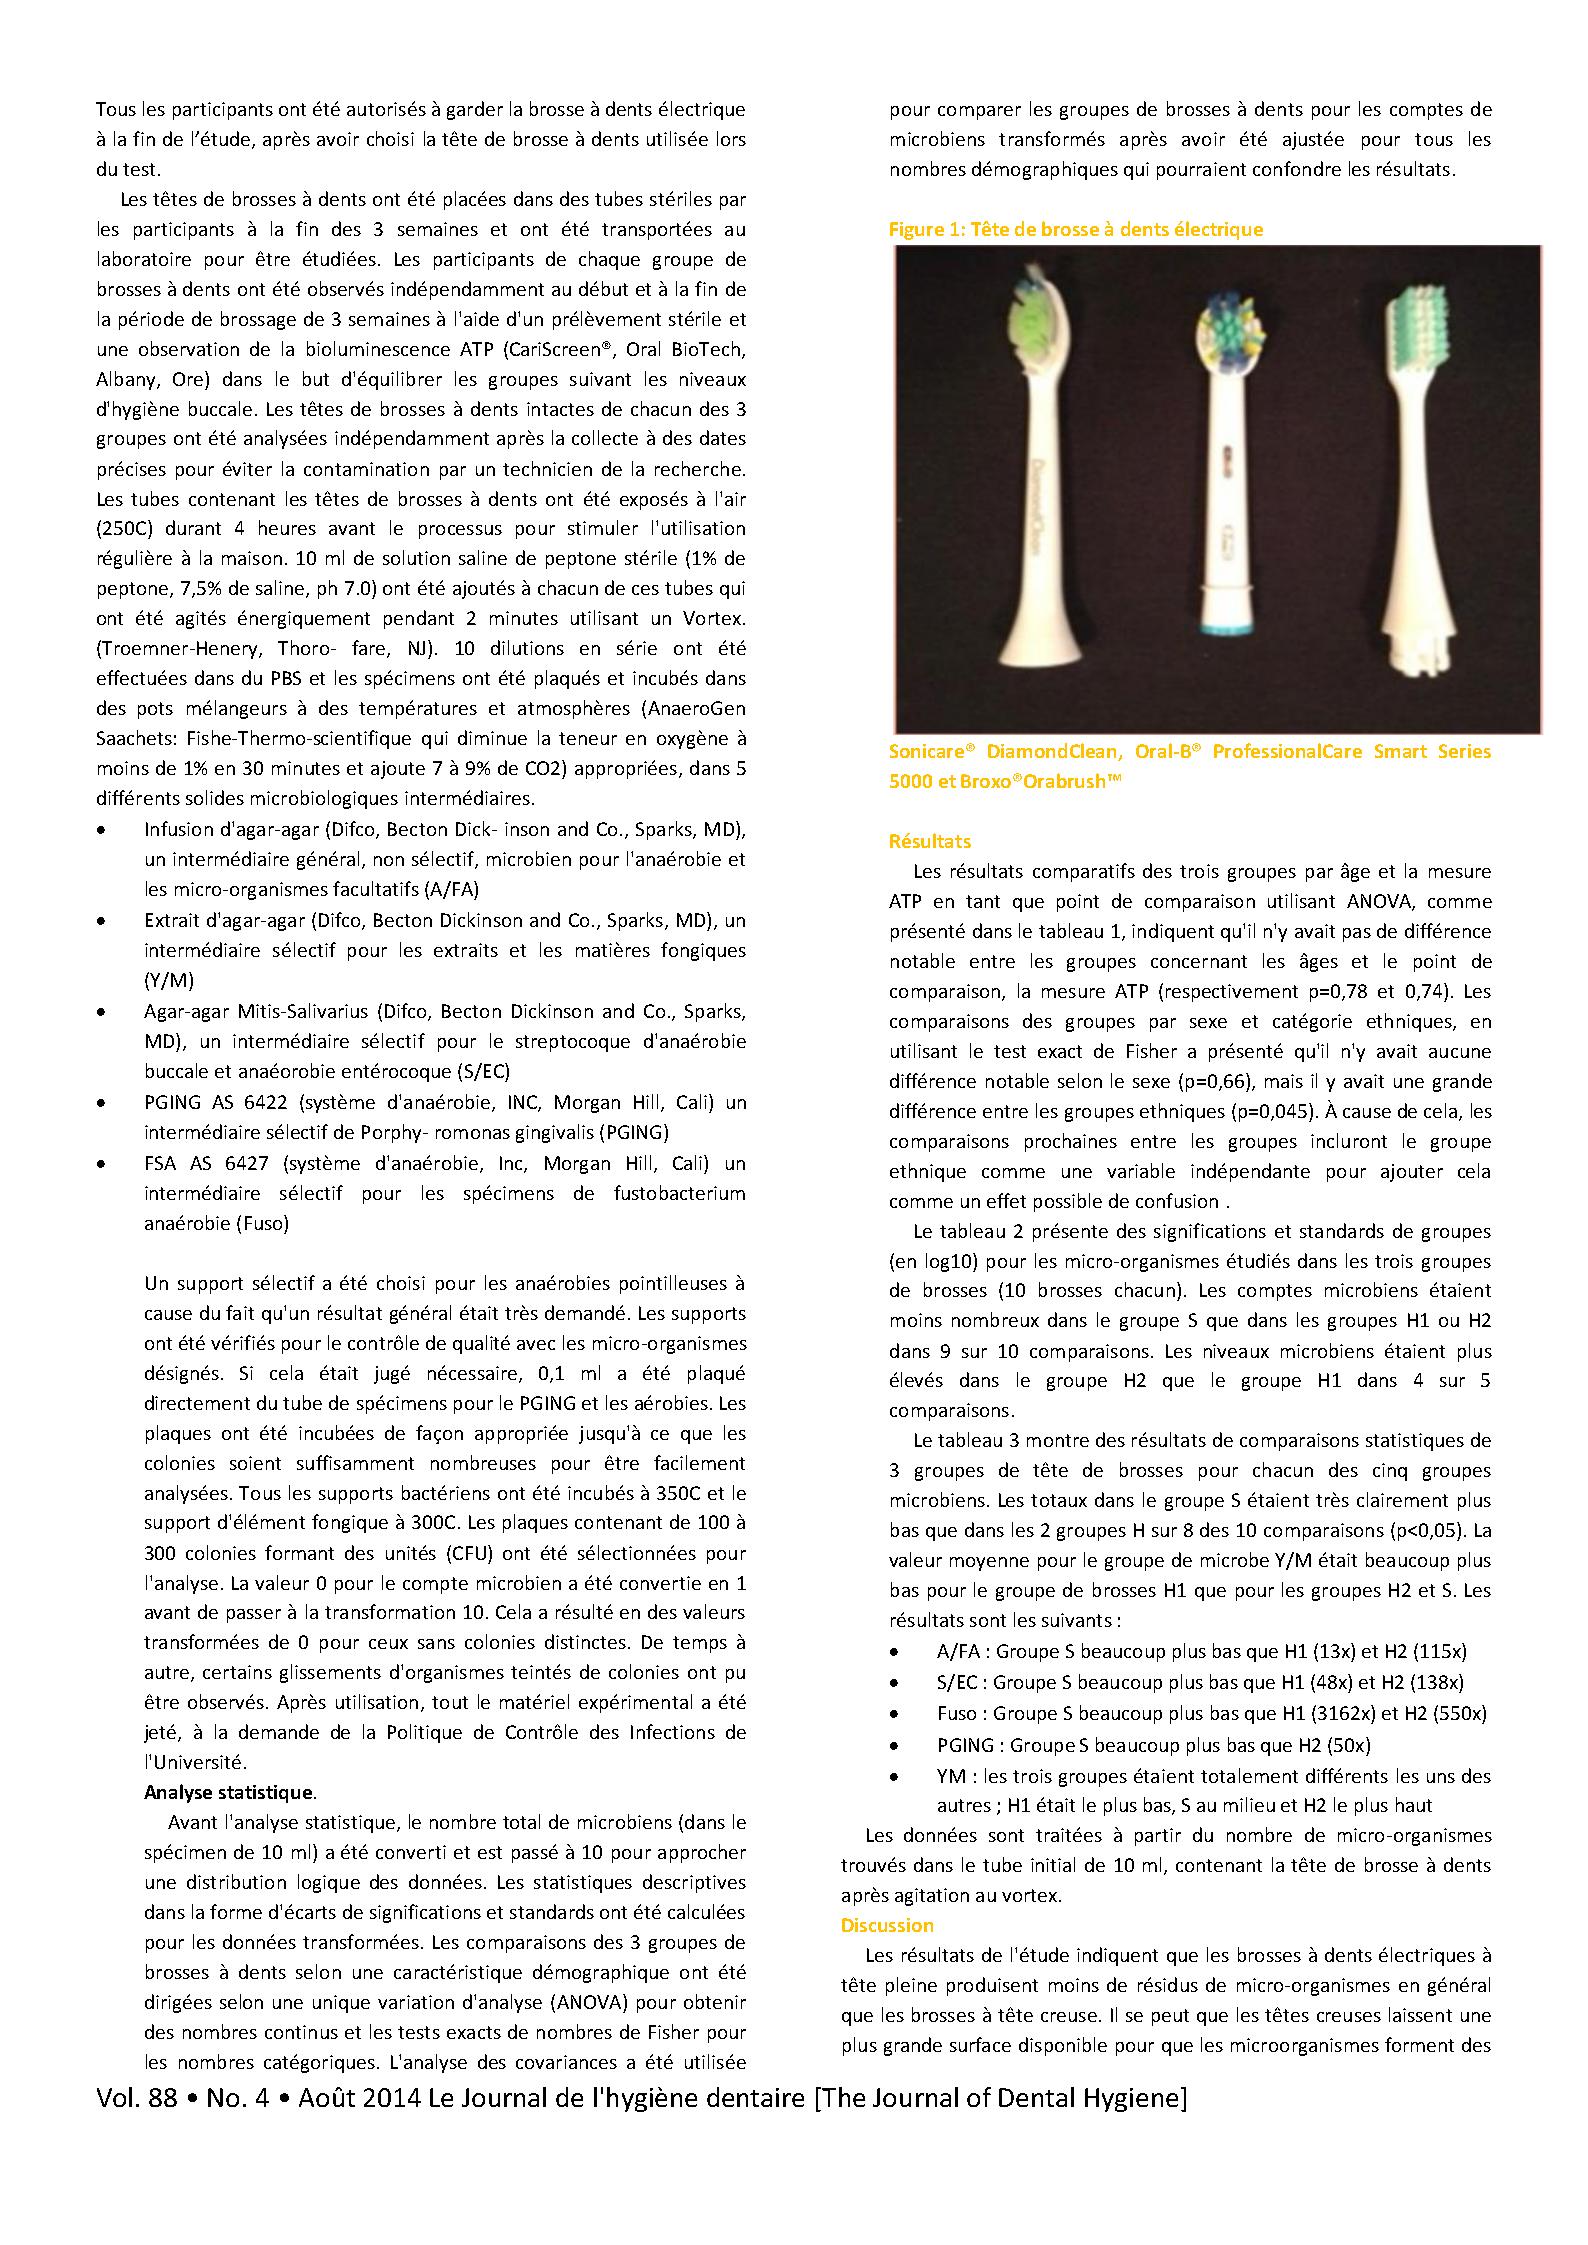 Etude9-page2